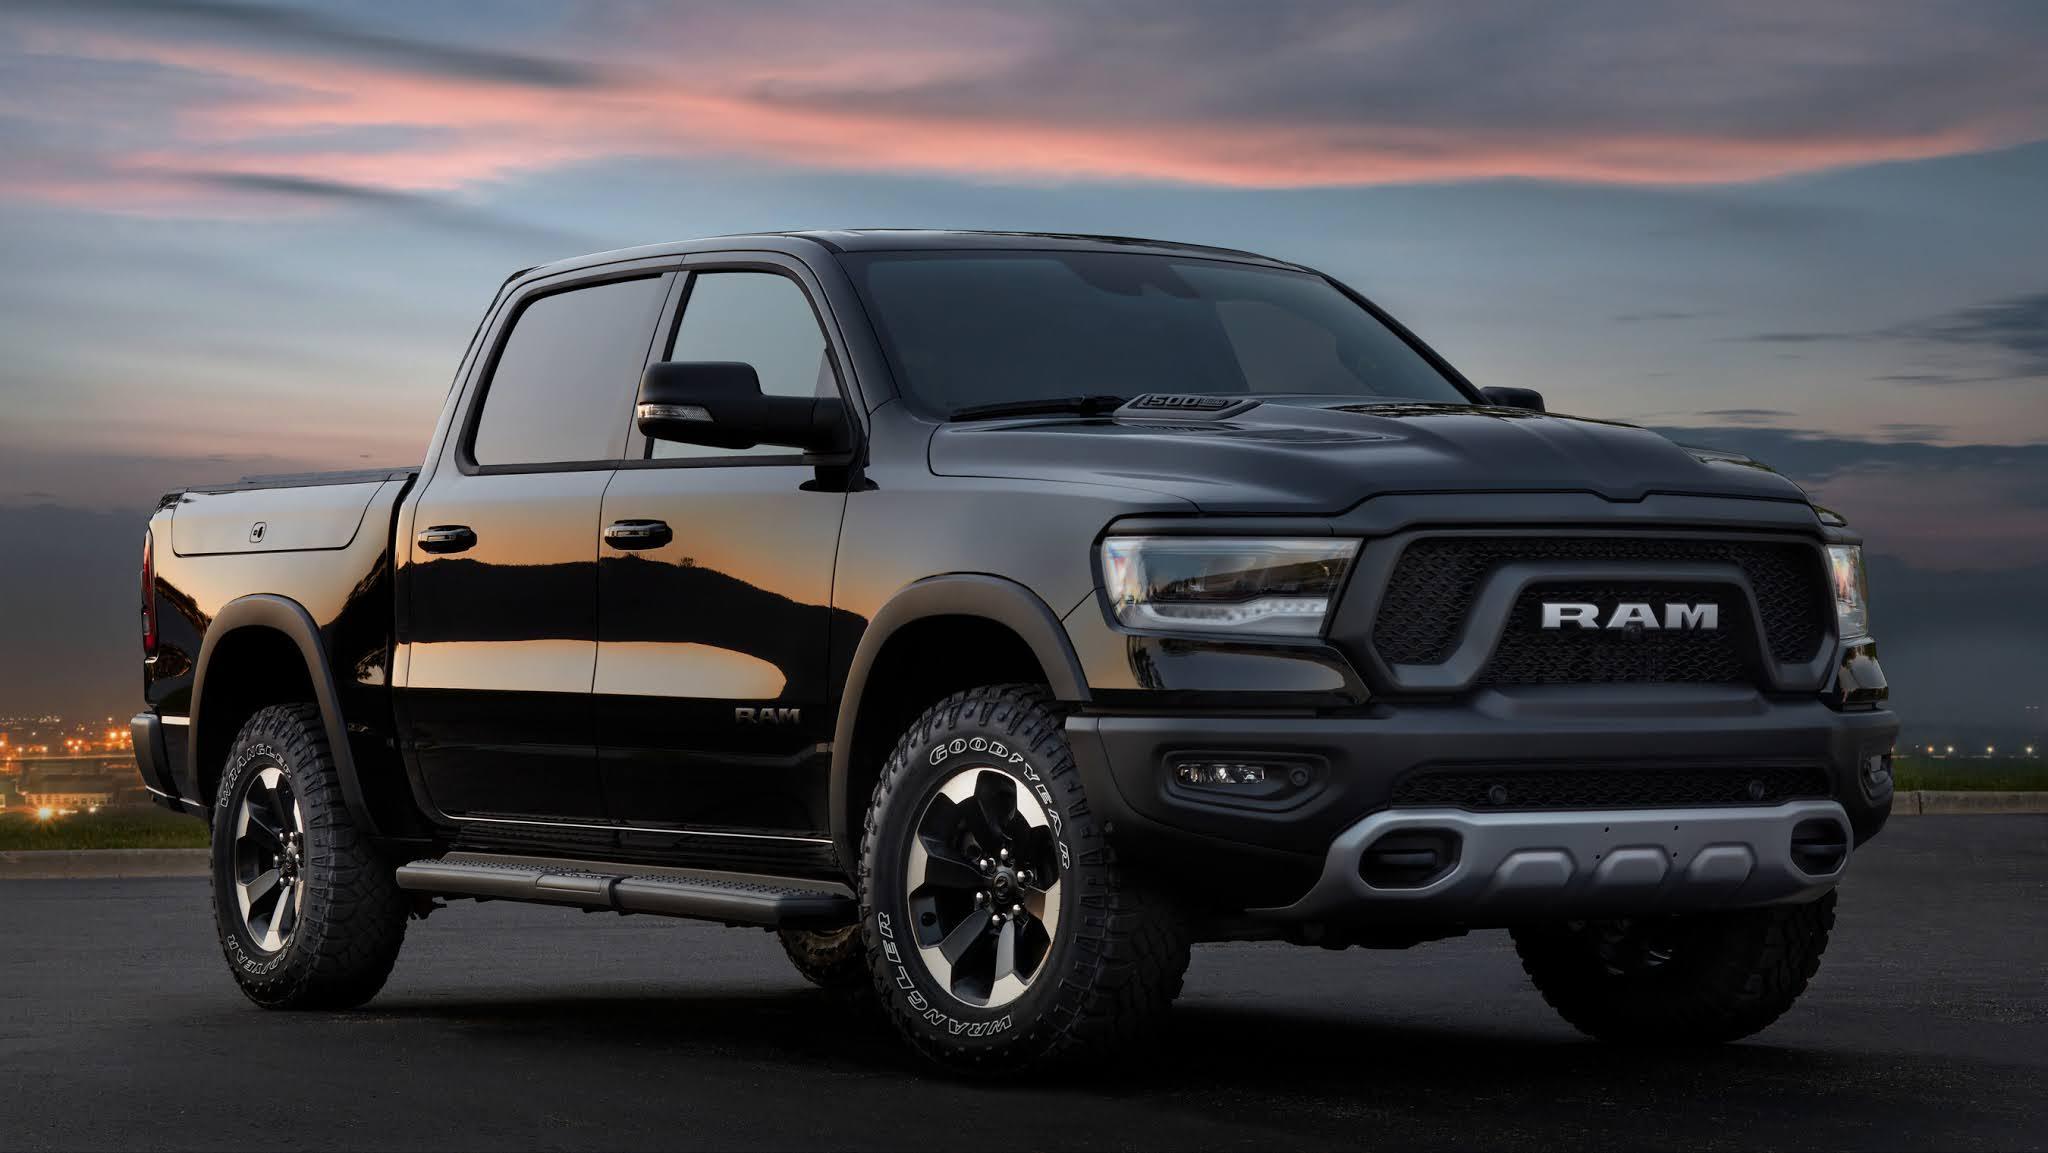 Ram 1500 Laramie G/T and Rebel G/T Highlight 2022 Ram Truck Lineup